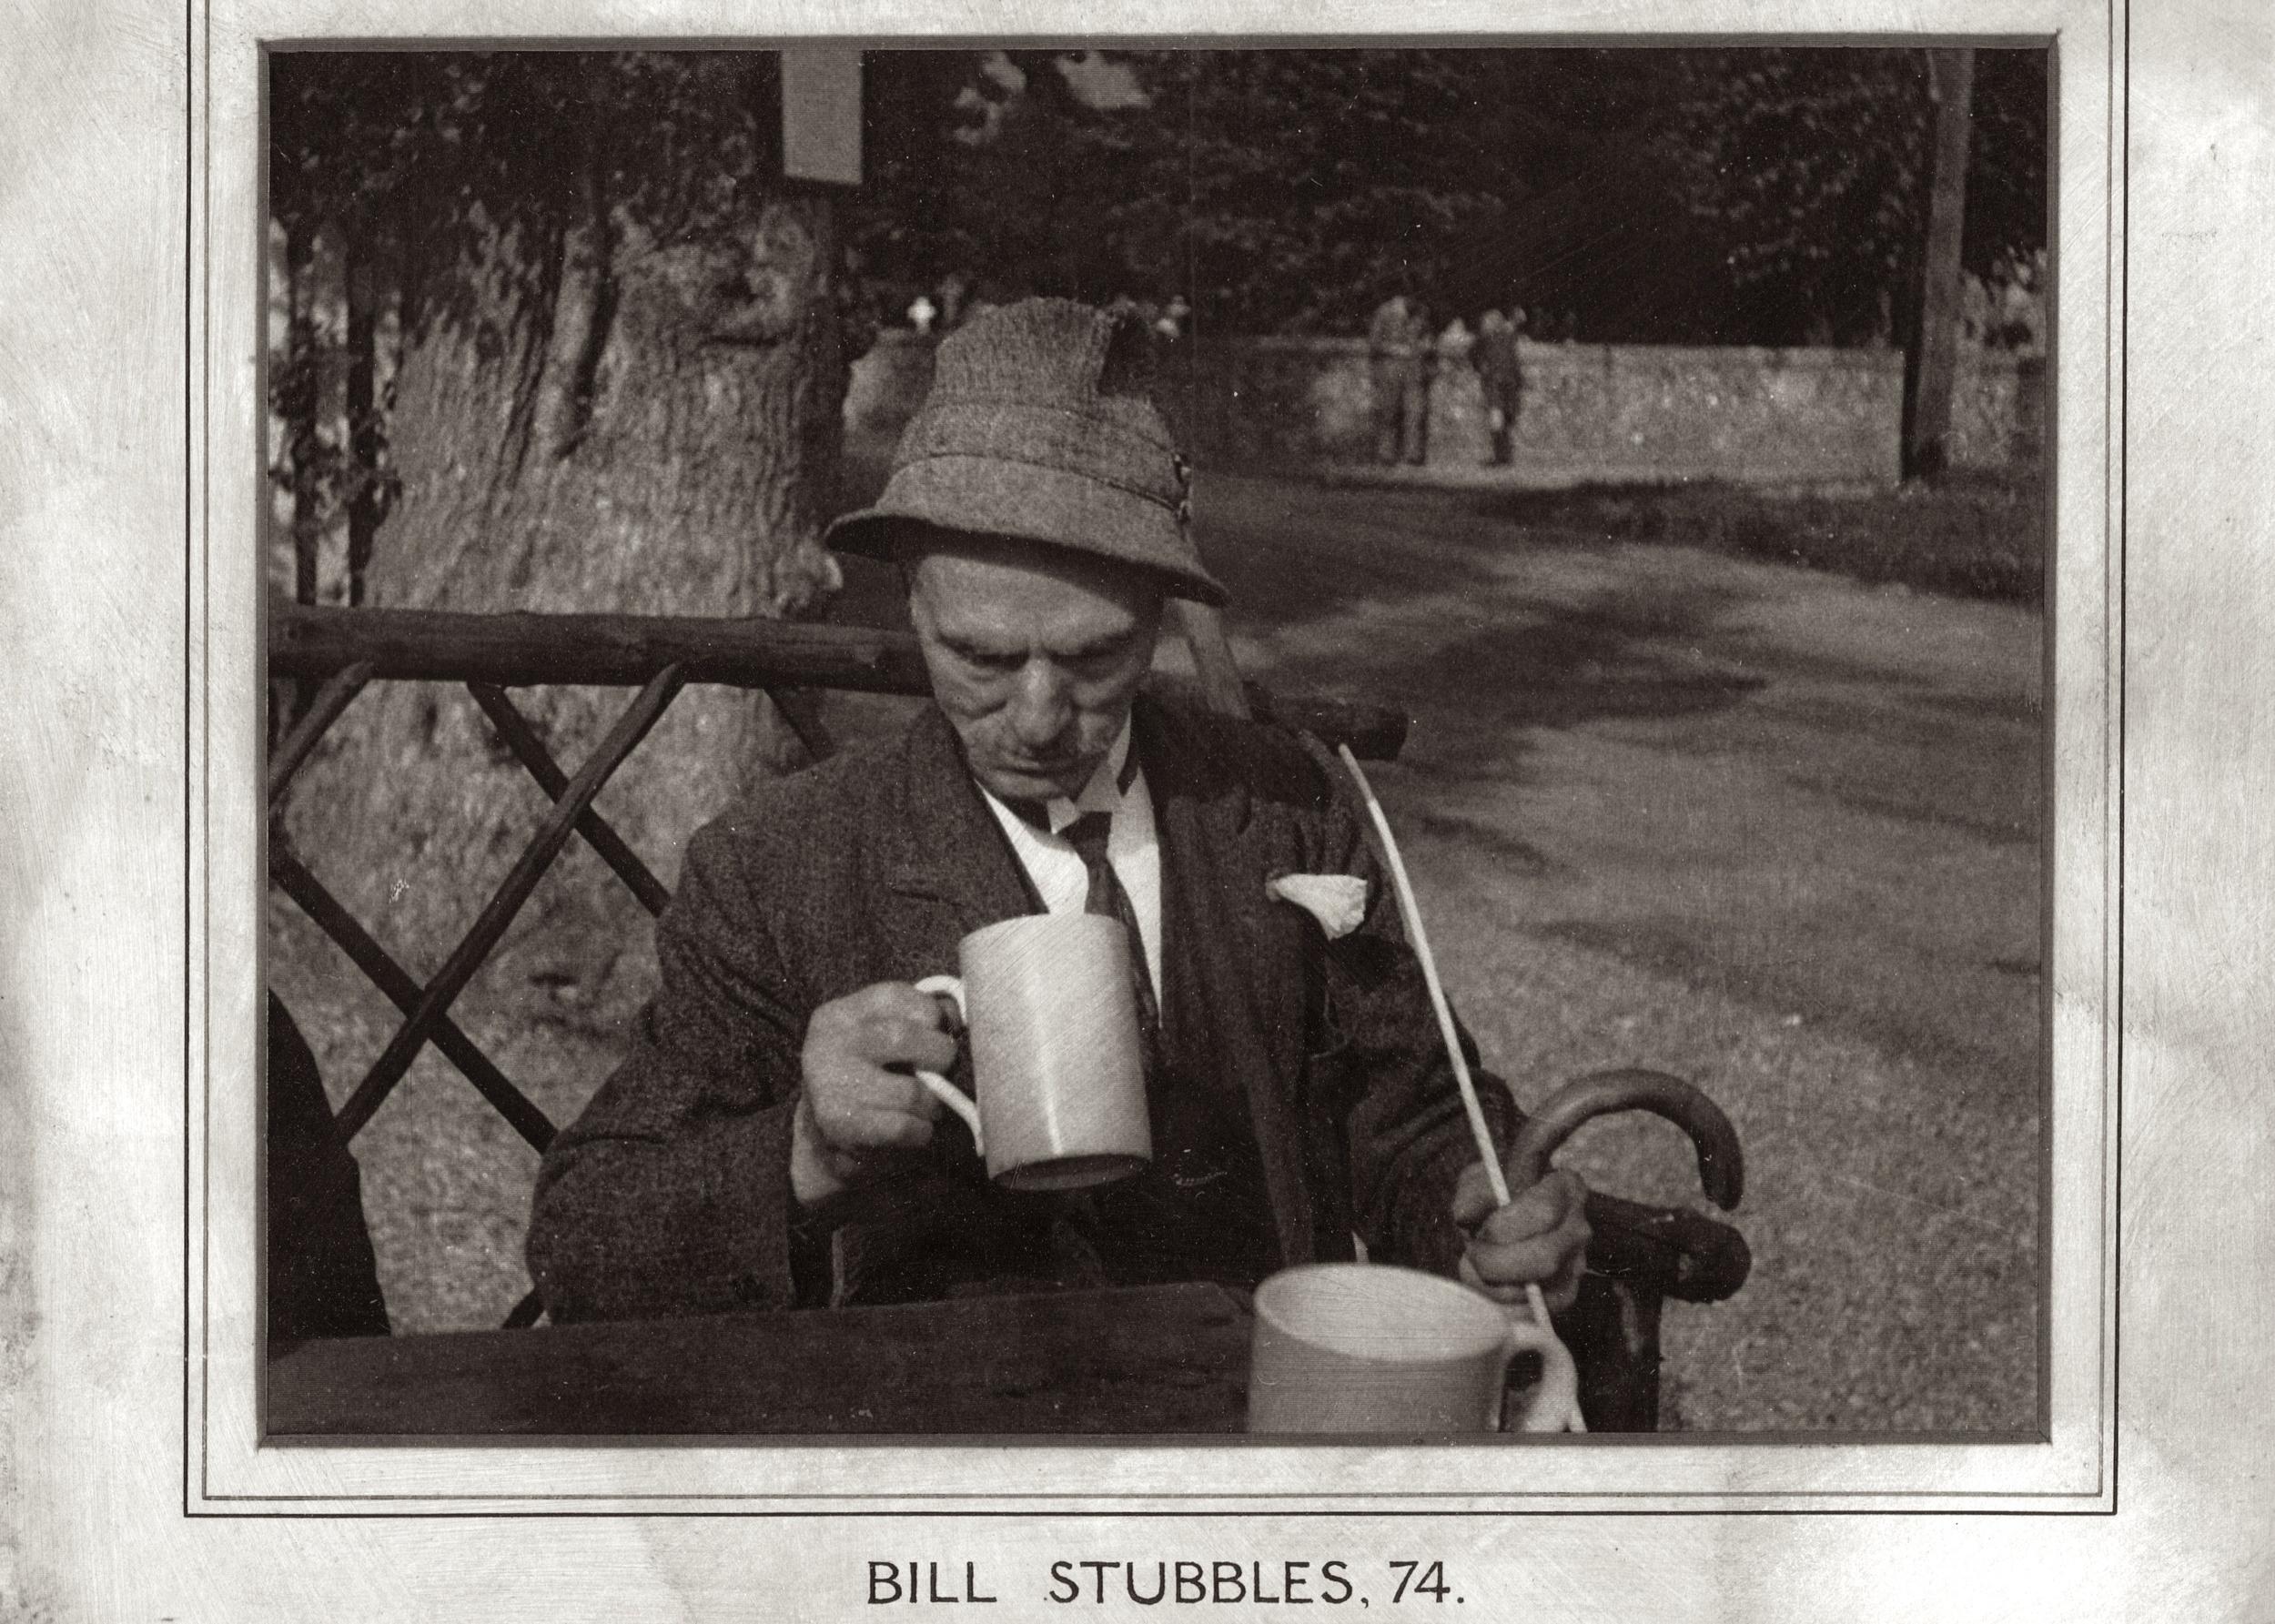 Bill Stubbles, 74